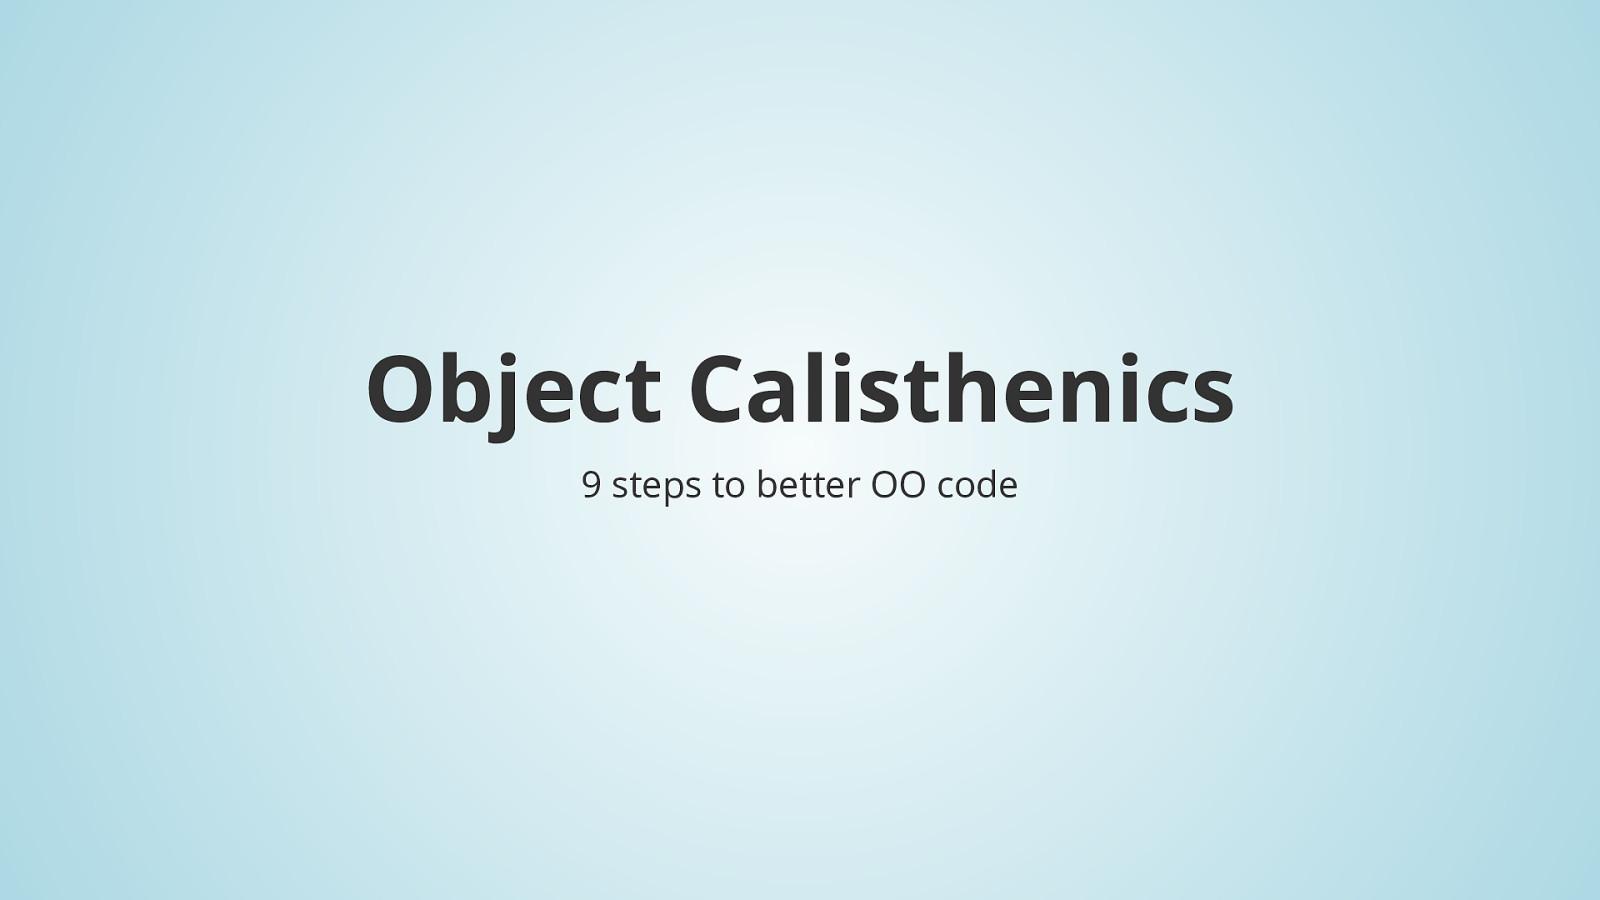 Object Calisthenics - 9 steps to better OO code